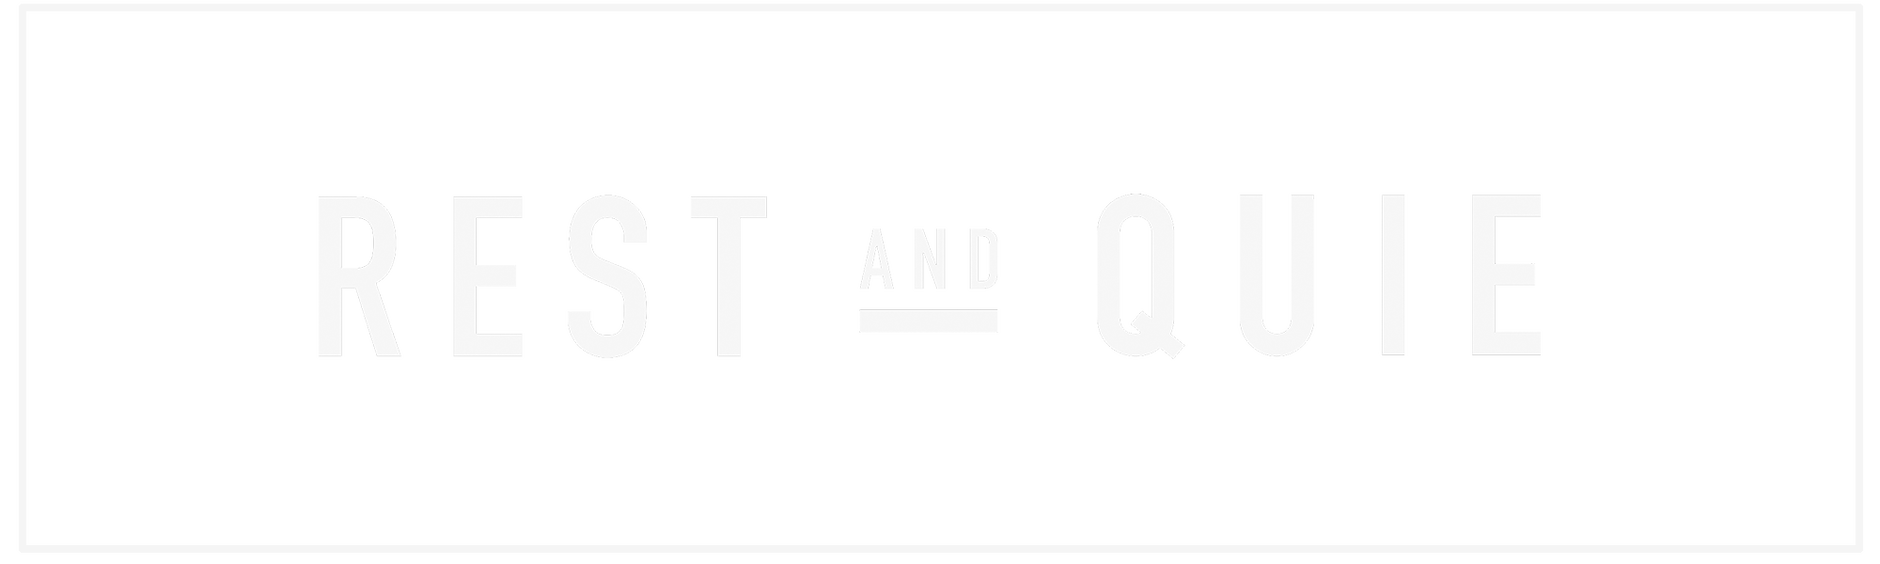 REST AND QUIE